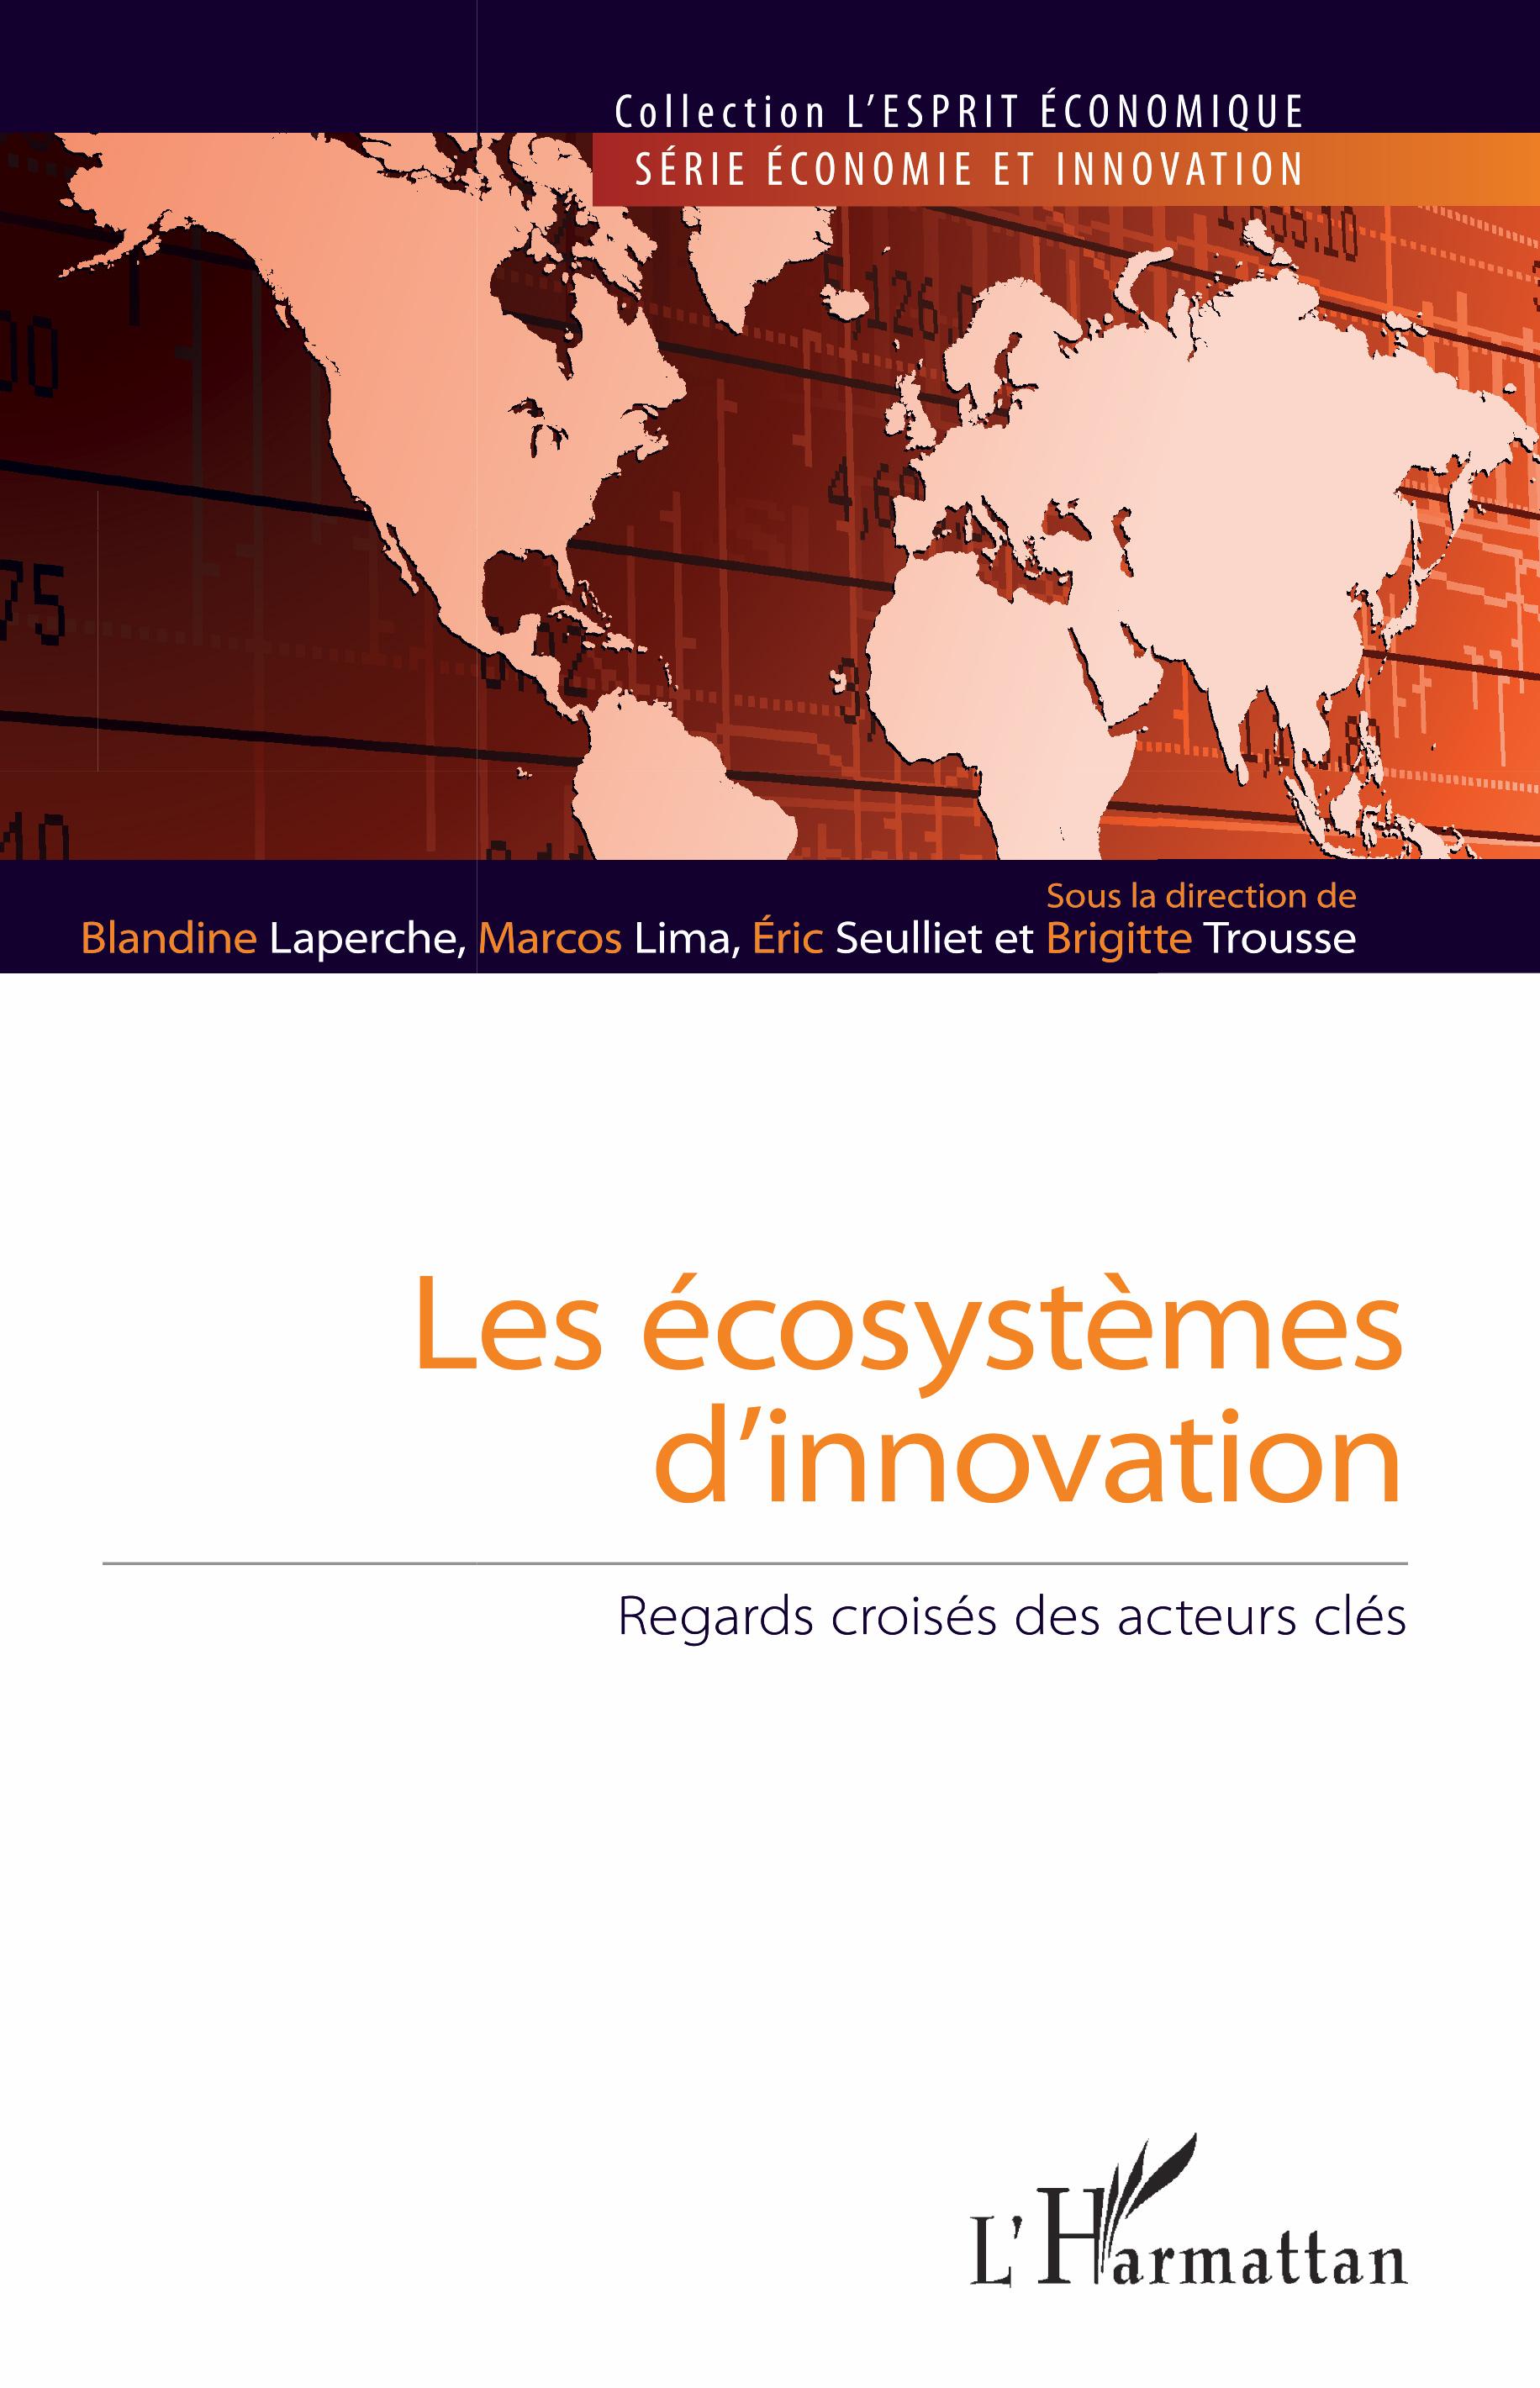 https://www.editions-harmattan.fr/index.asp?navig=catalogue&obj=livre&no=62879&motExact=0&motcle=&mode=AND